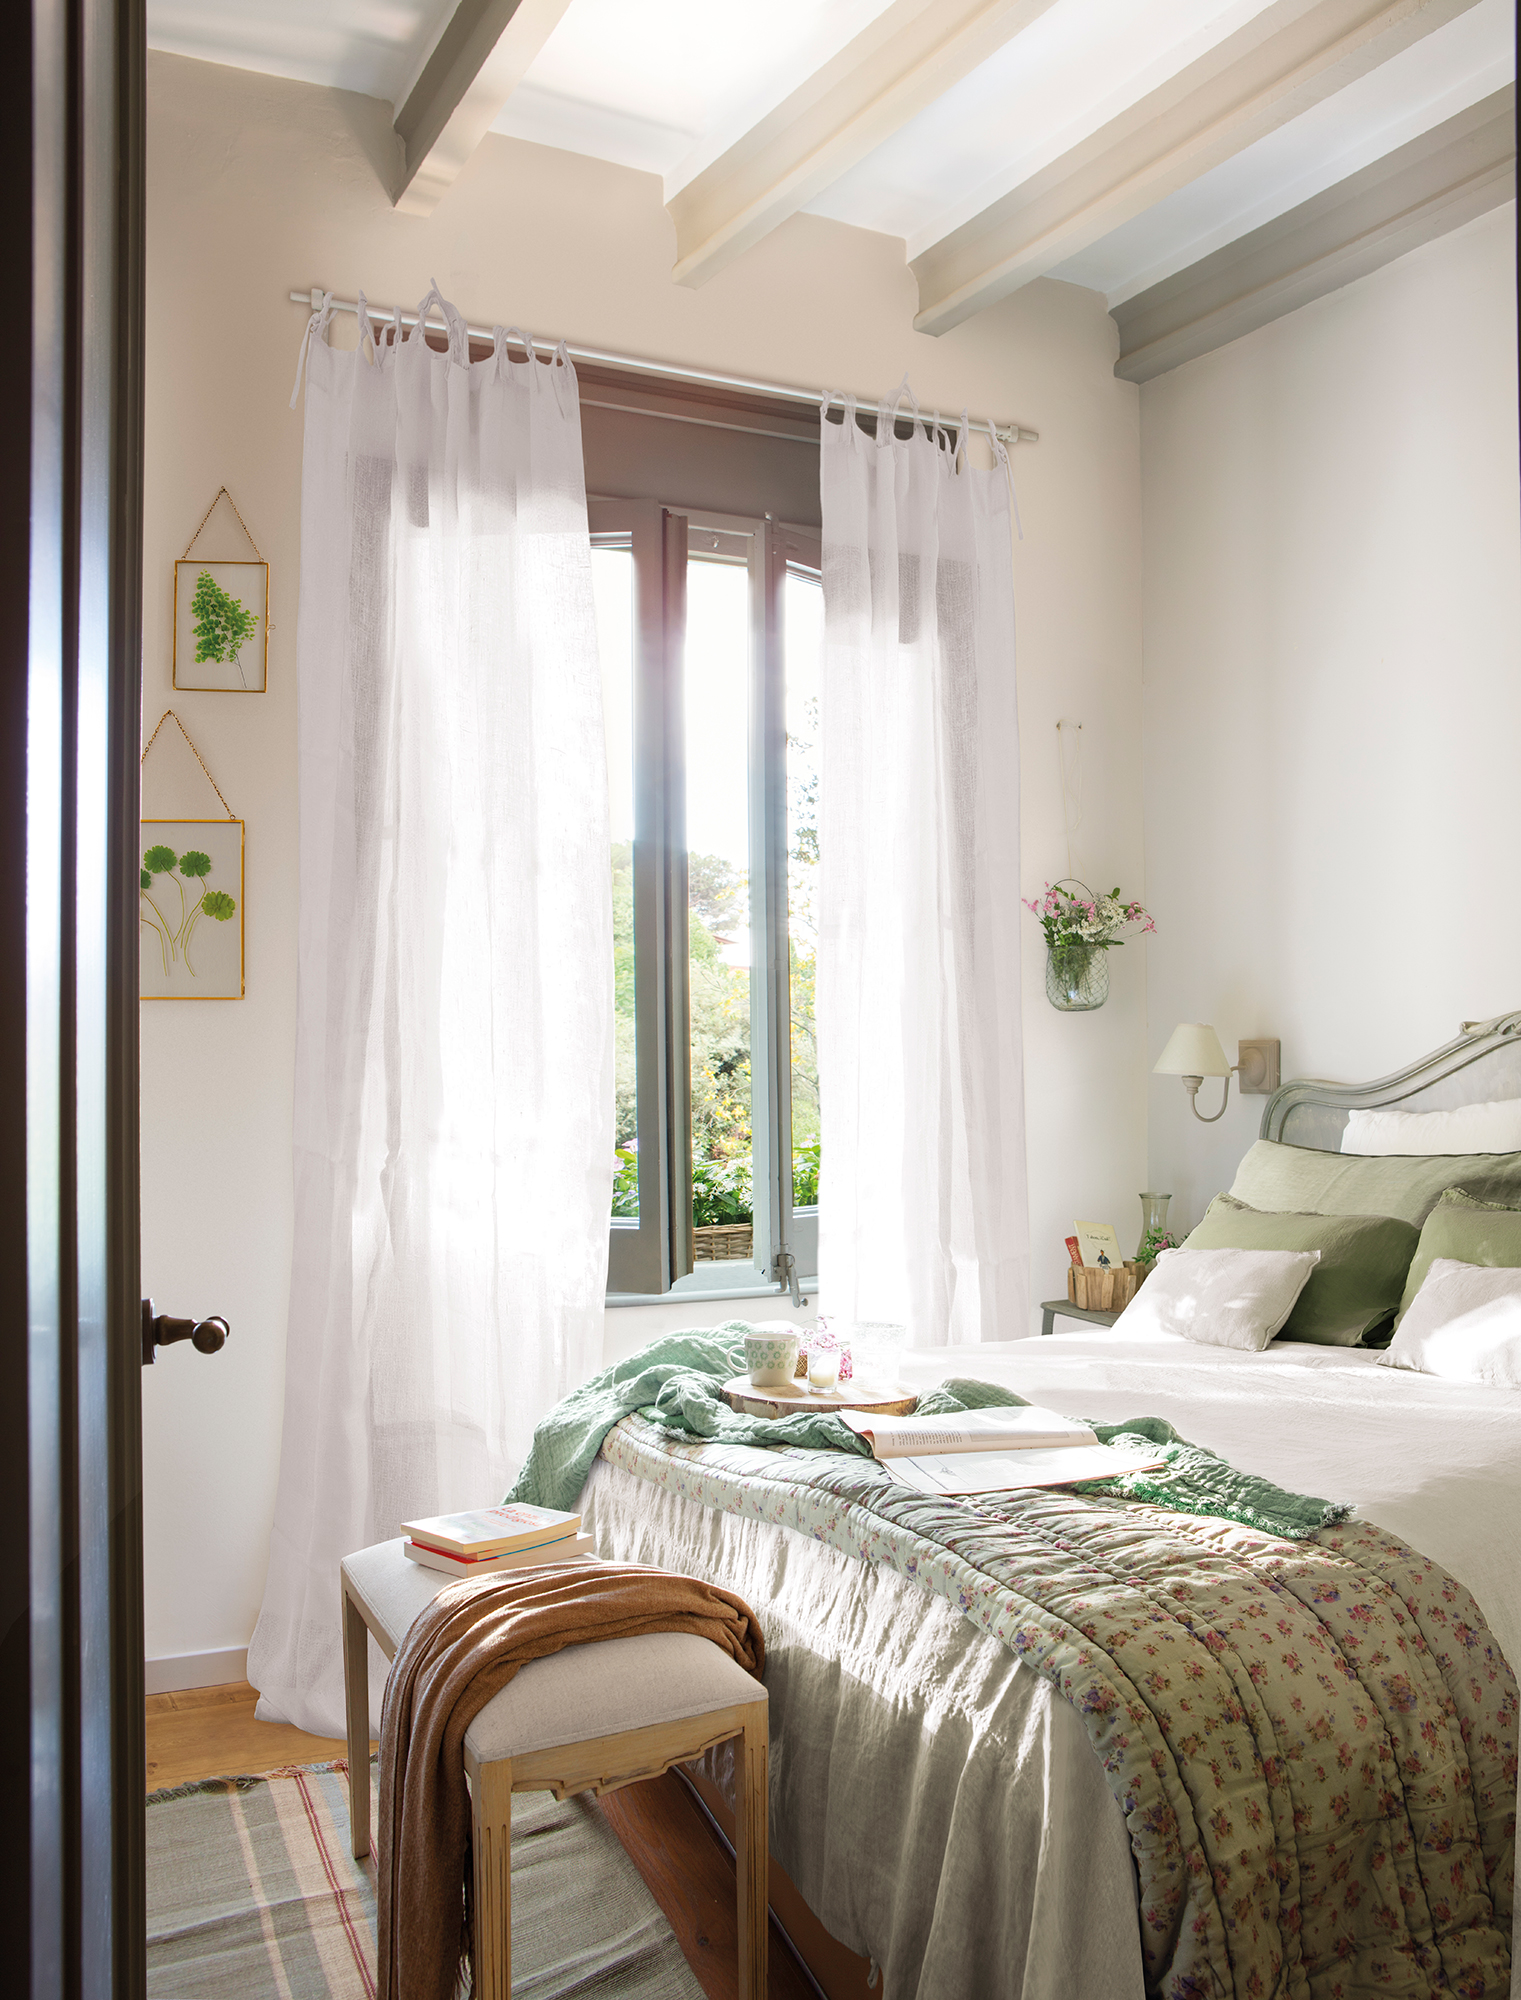 00465069b. Dormitorio pequeño de aire comántico_00465069b